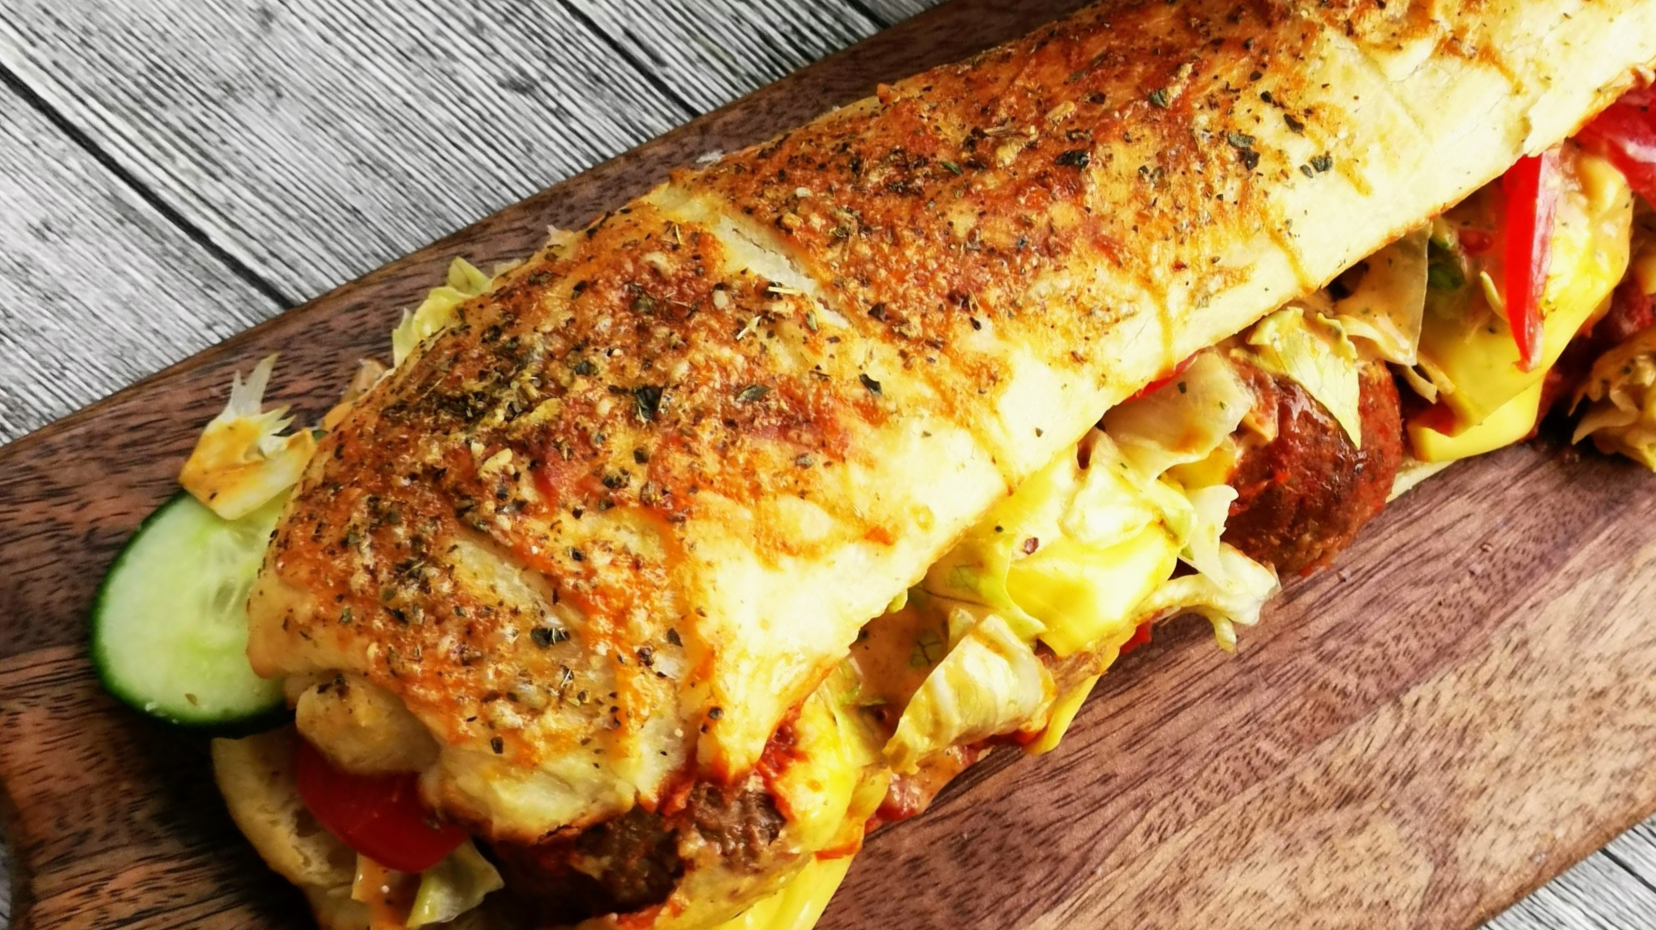 Meatball Subs Rezept – Subway Sandwiches mit Hackbällchen